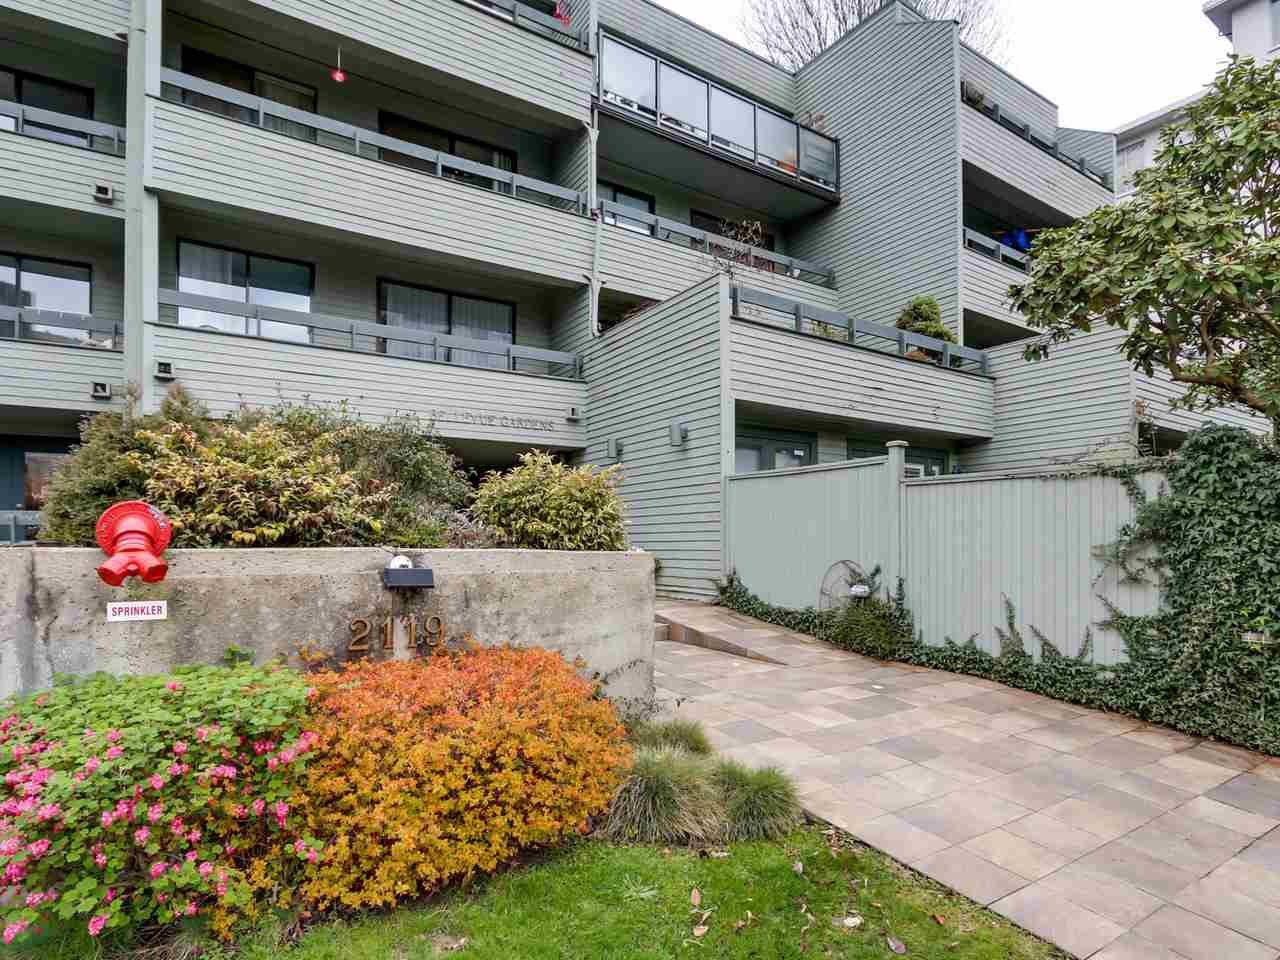 "Main Photo: 306 2119 BELLEVUE Avenue in West Vancouver: Dundarave Condo for sale in ""BELLEVUE GARDENS"" : MLS®# R2048496"